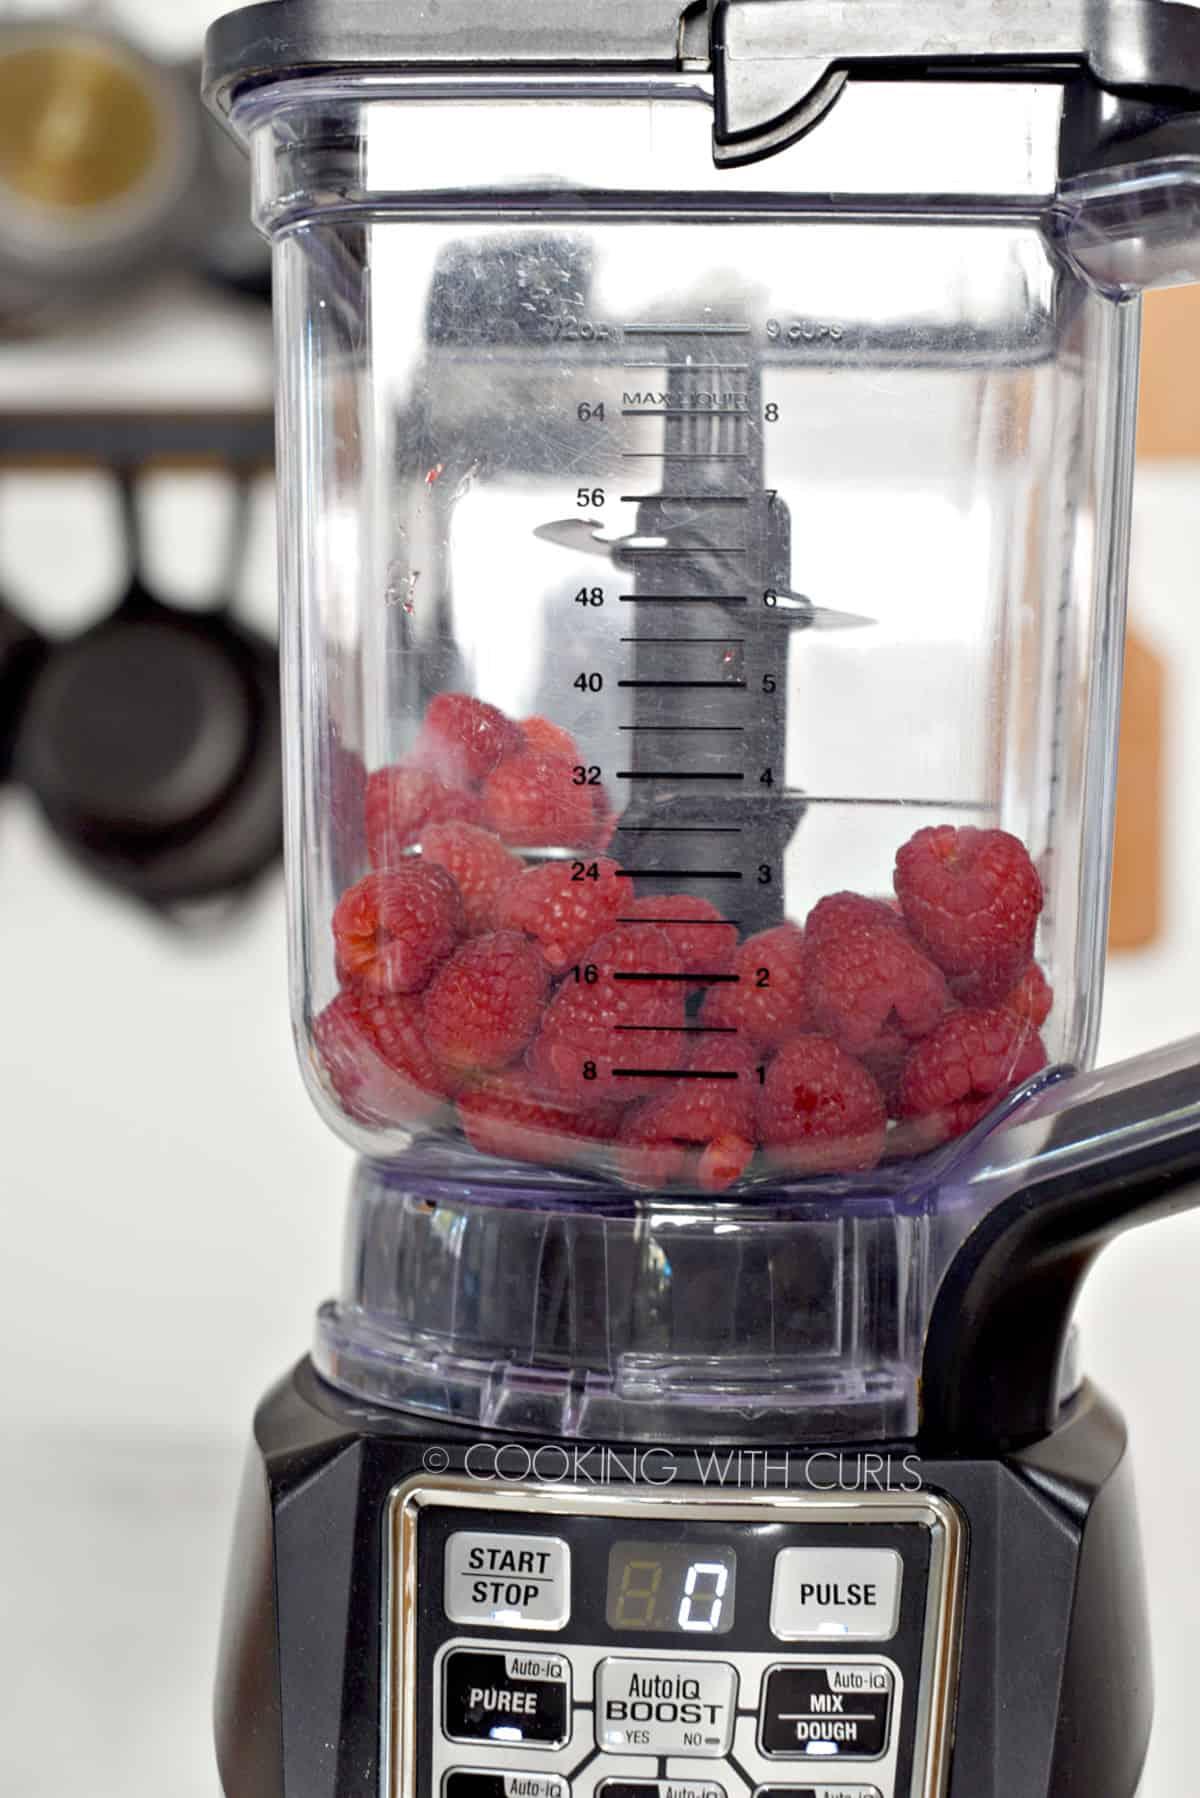 Fresh raspberries in a blender.